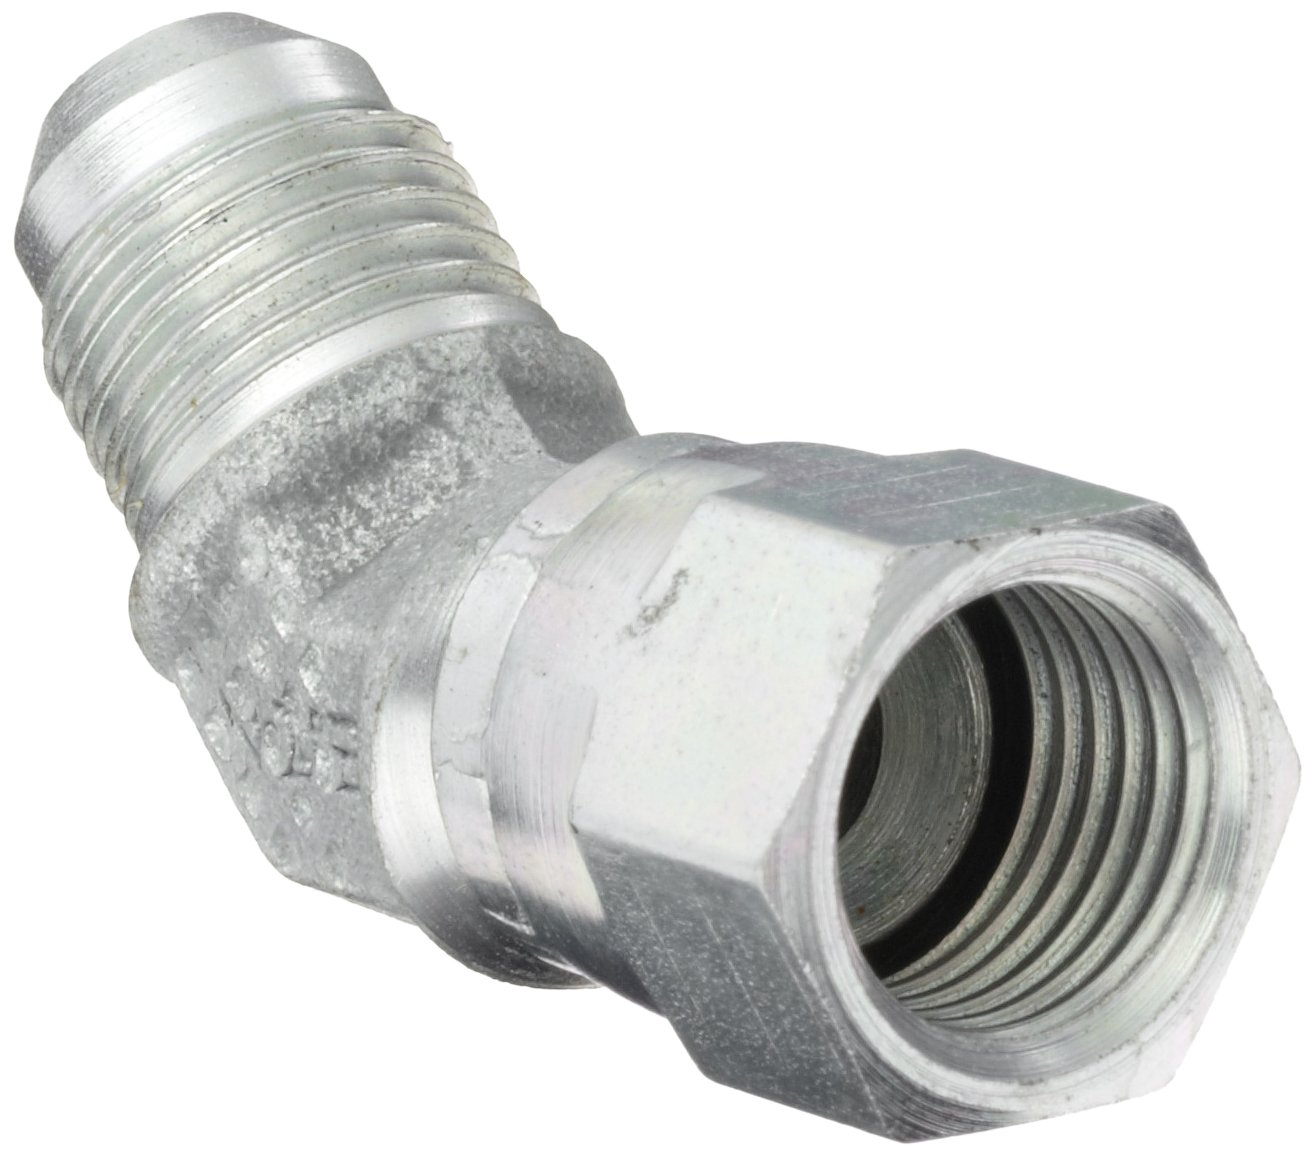 Eaton Aeroquip 2070-6-6S 45 Degree Swivel Nut Elbow, JIC 37 Degree End Types, Carbon Steel, 3/8 JIC(f) x 3/8 JIC(m) End Size, 3/8'' Tube OD by Aeroquip